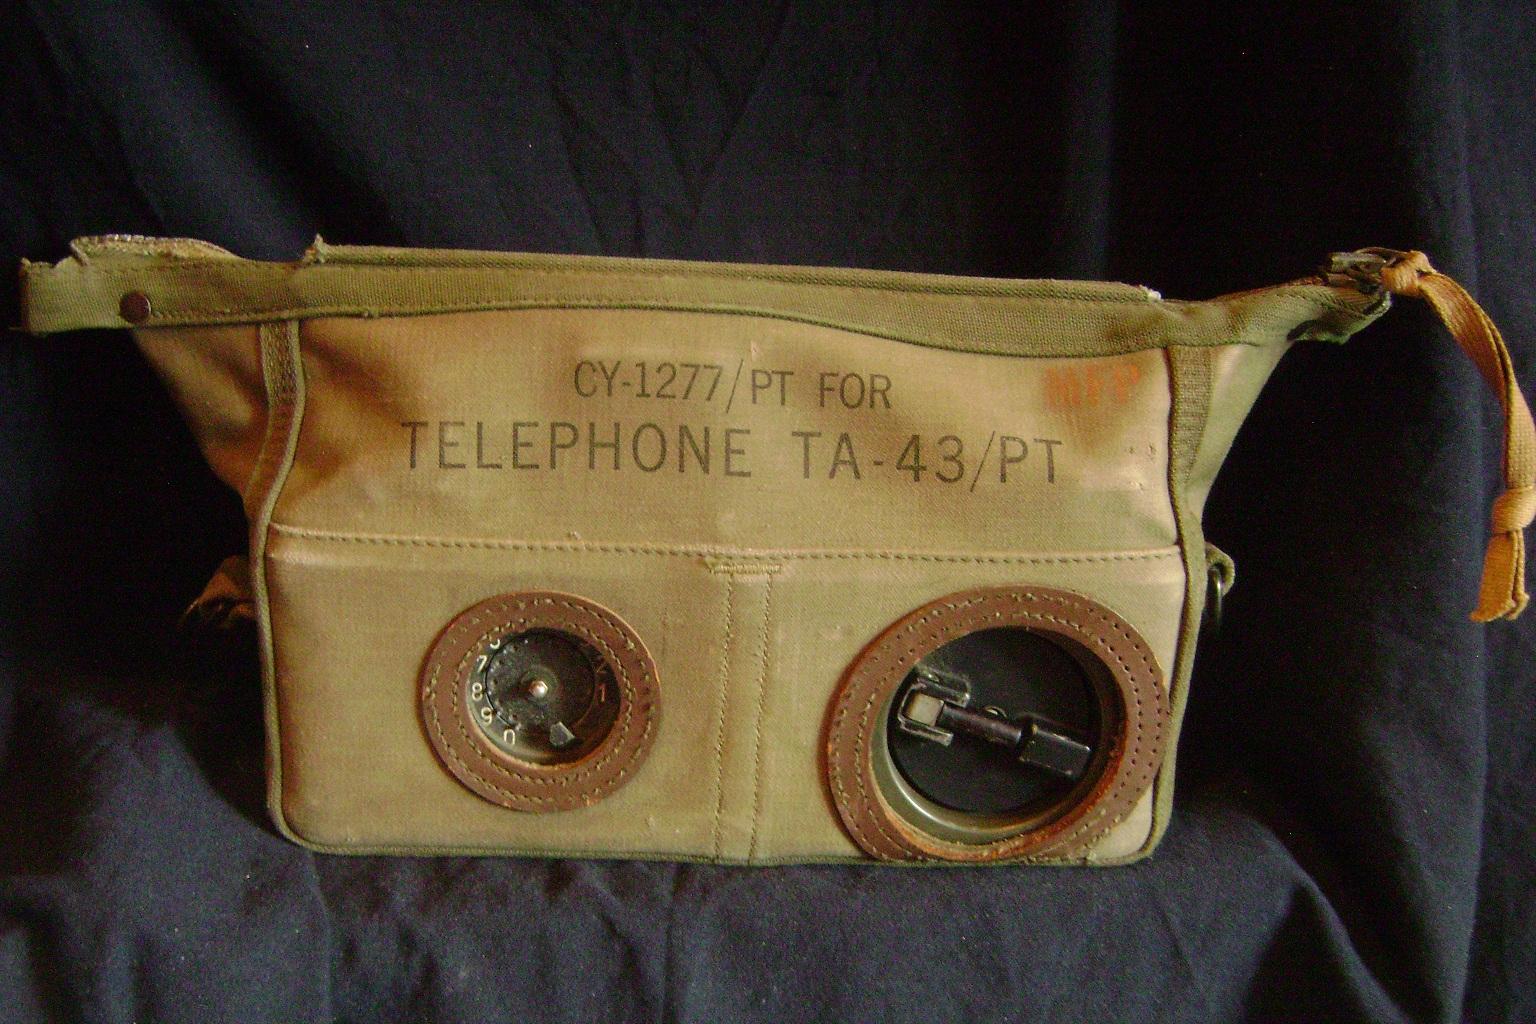 Poljski_telefon_USA_TA-43PT_1950_1.JPG